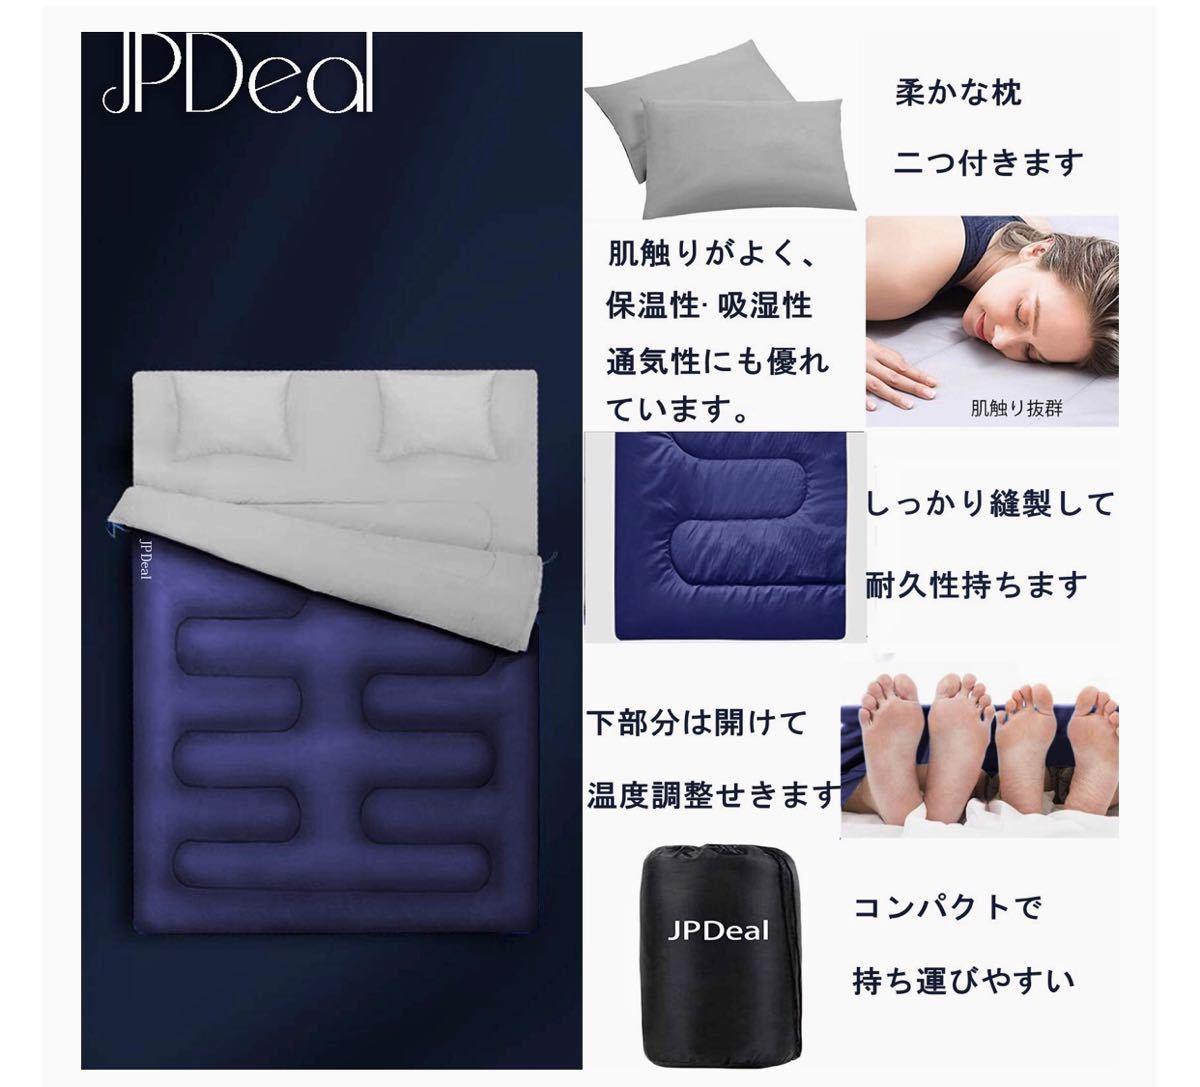 JPDeal 寝袋 封筒型 シュラフ コンプレッションバッグ 枕付き 210T防水シュラフ 連結可能 保温 軽量 コンパクト